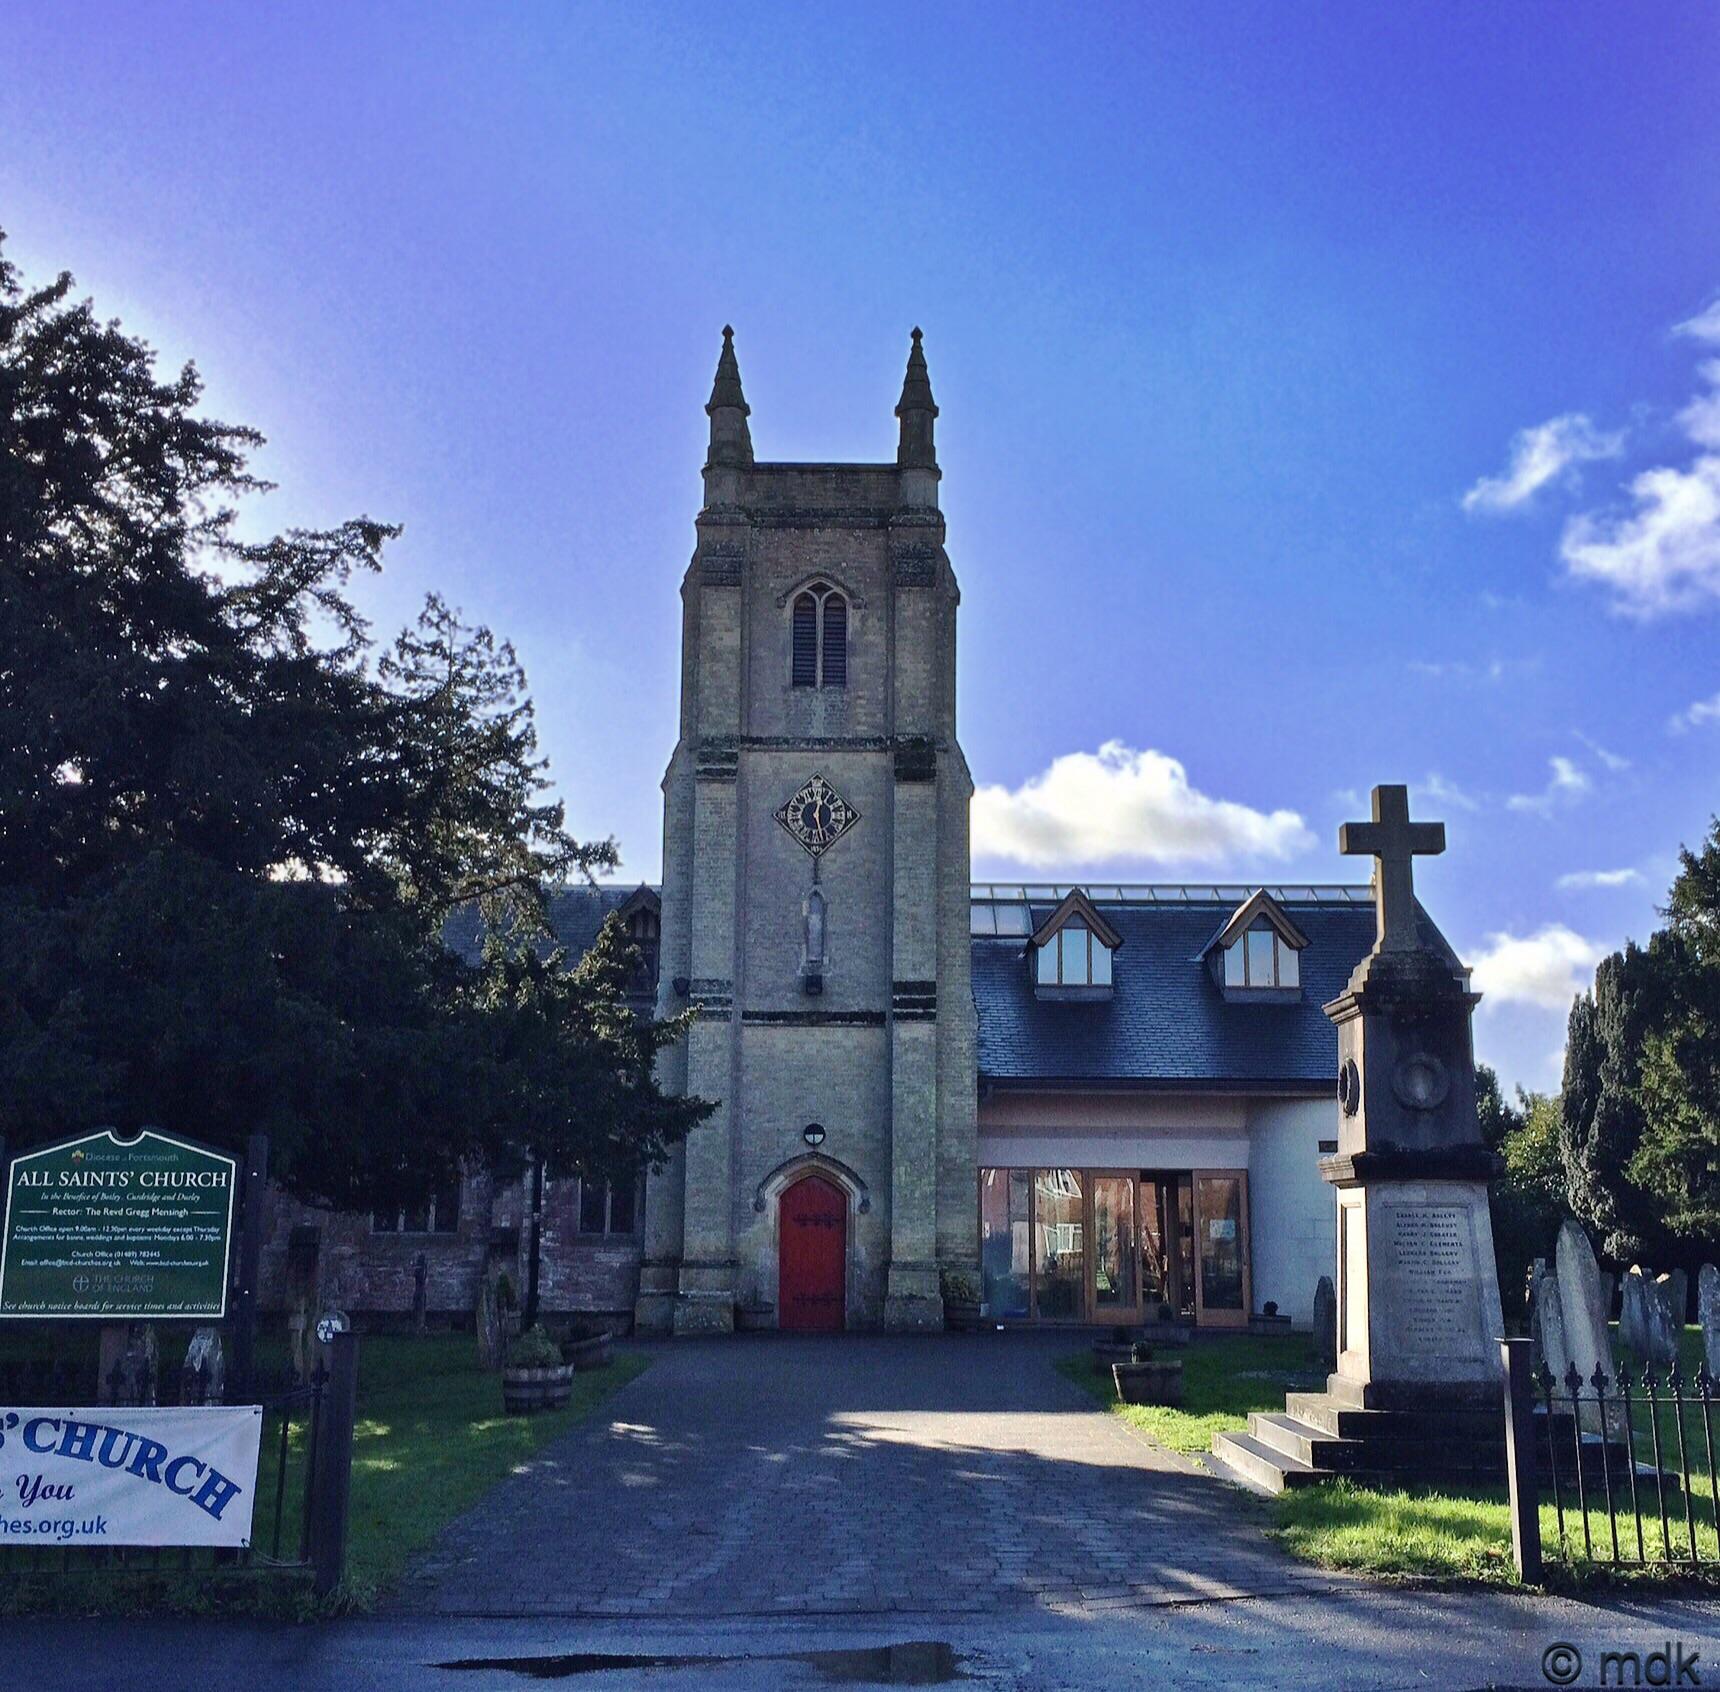 All Saints' Church Botley